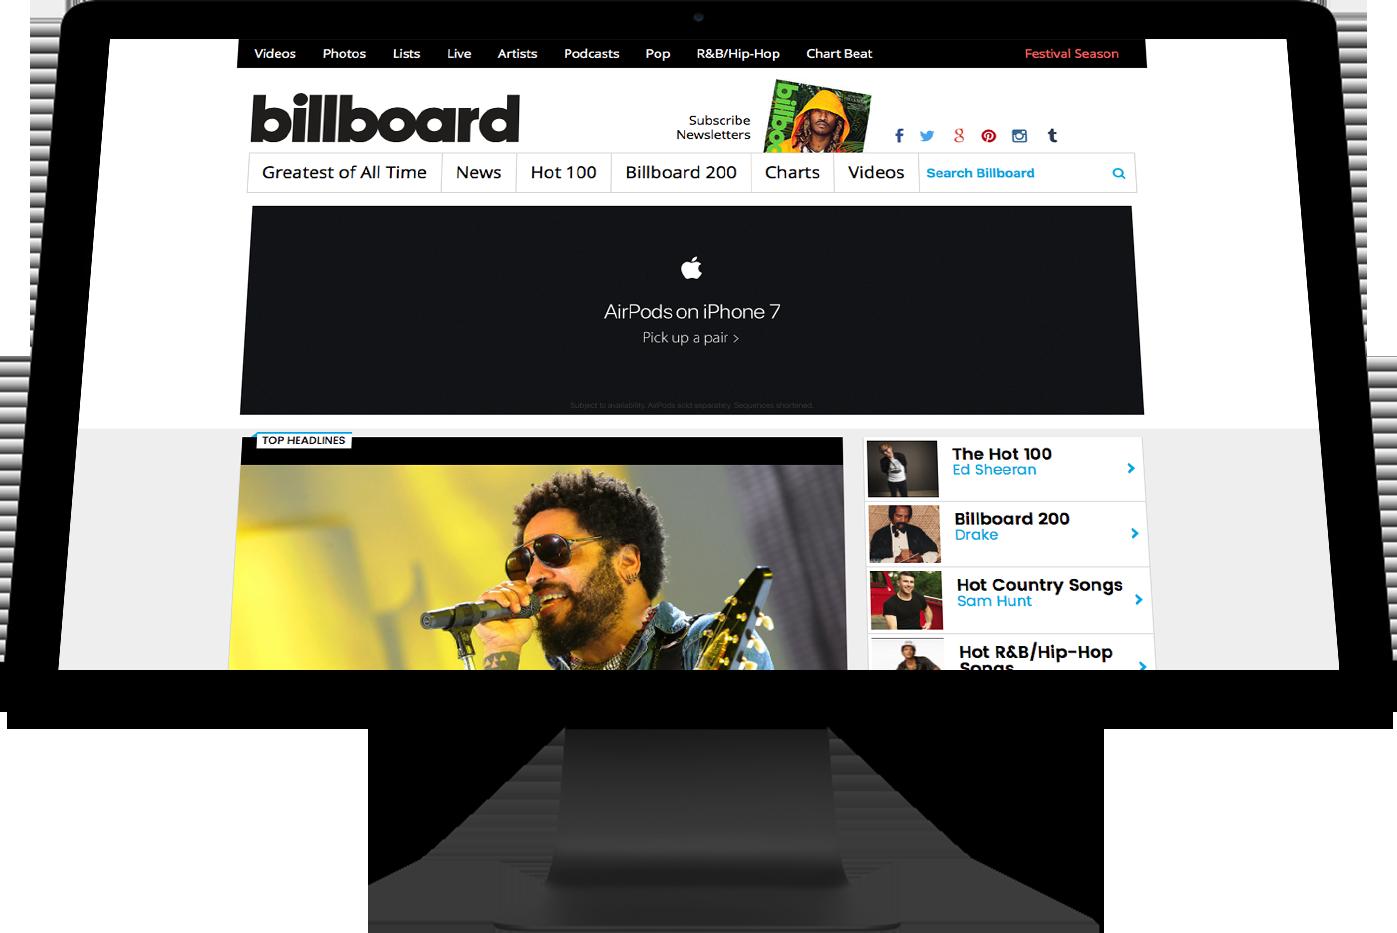 Billboard Header Overlaying Image